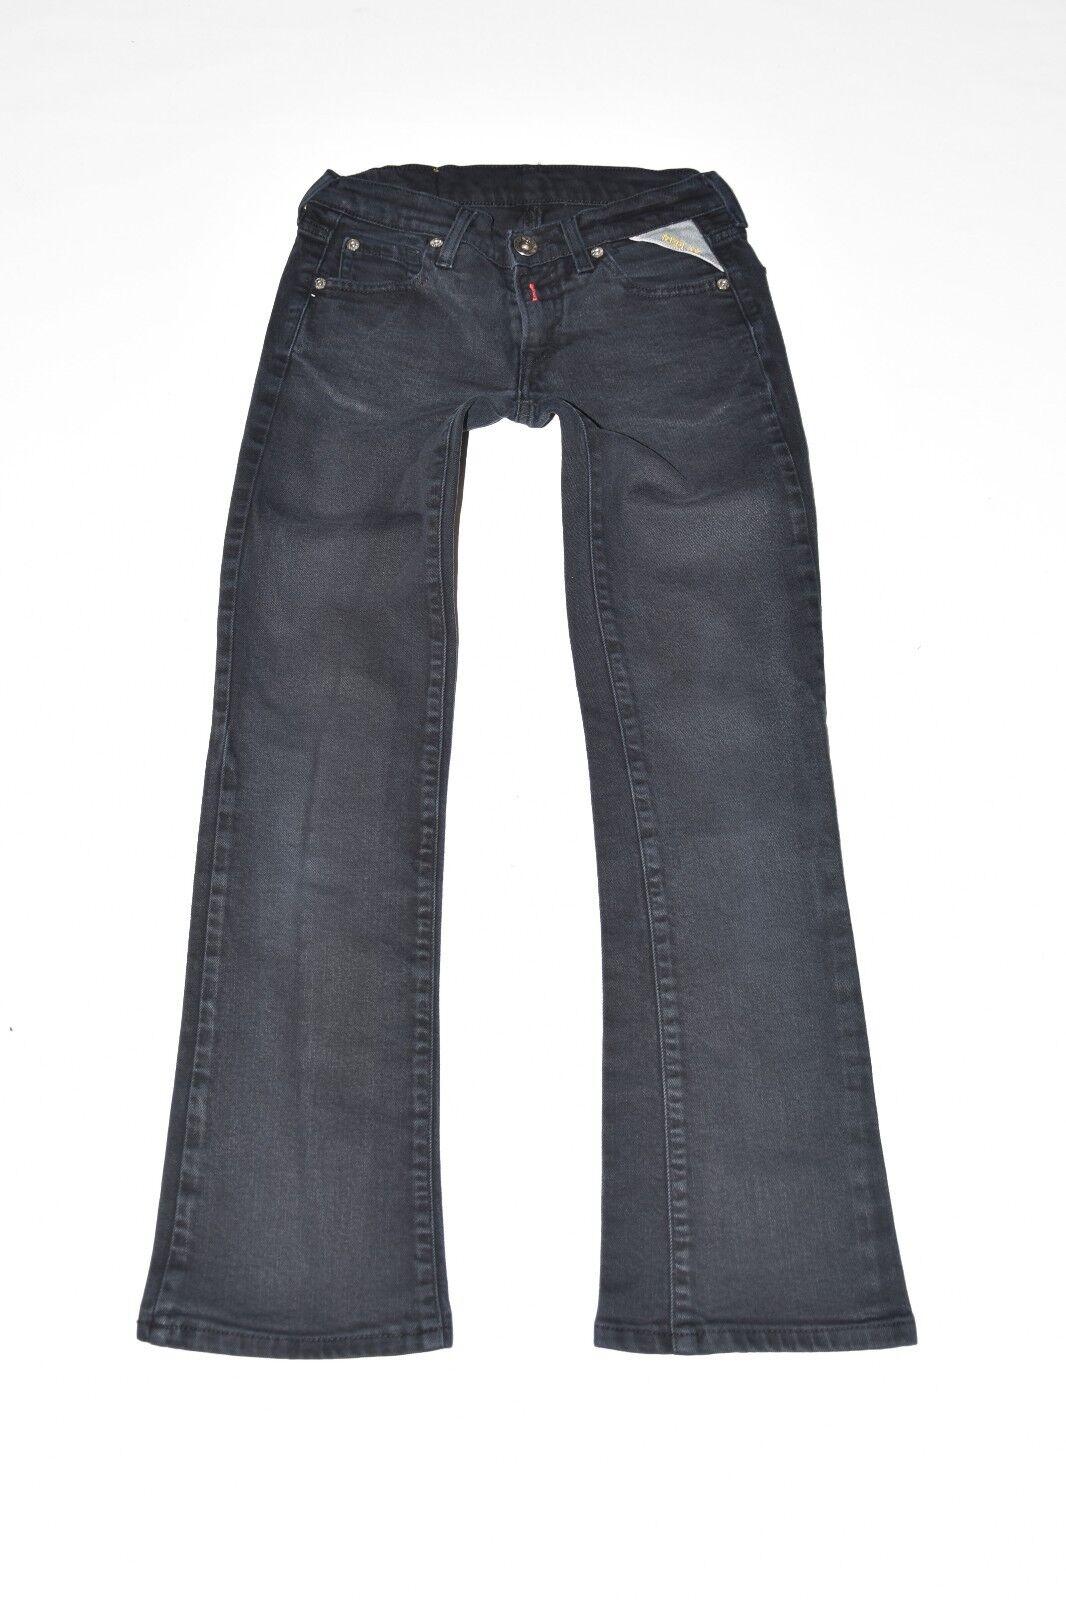 878ddf436dda Denim nero REPLAY REPLAY REPLAY avviocut Stretch Casual Donna Jeans TAGLIA  W25 L27 2e51c4